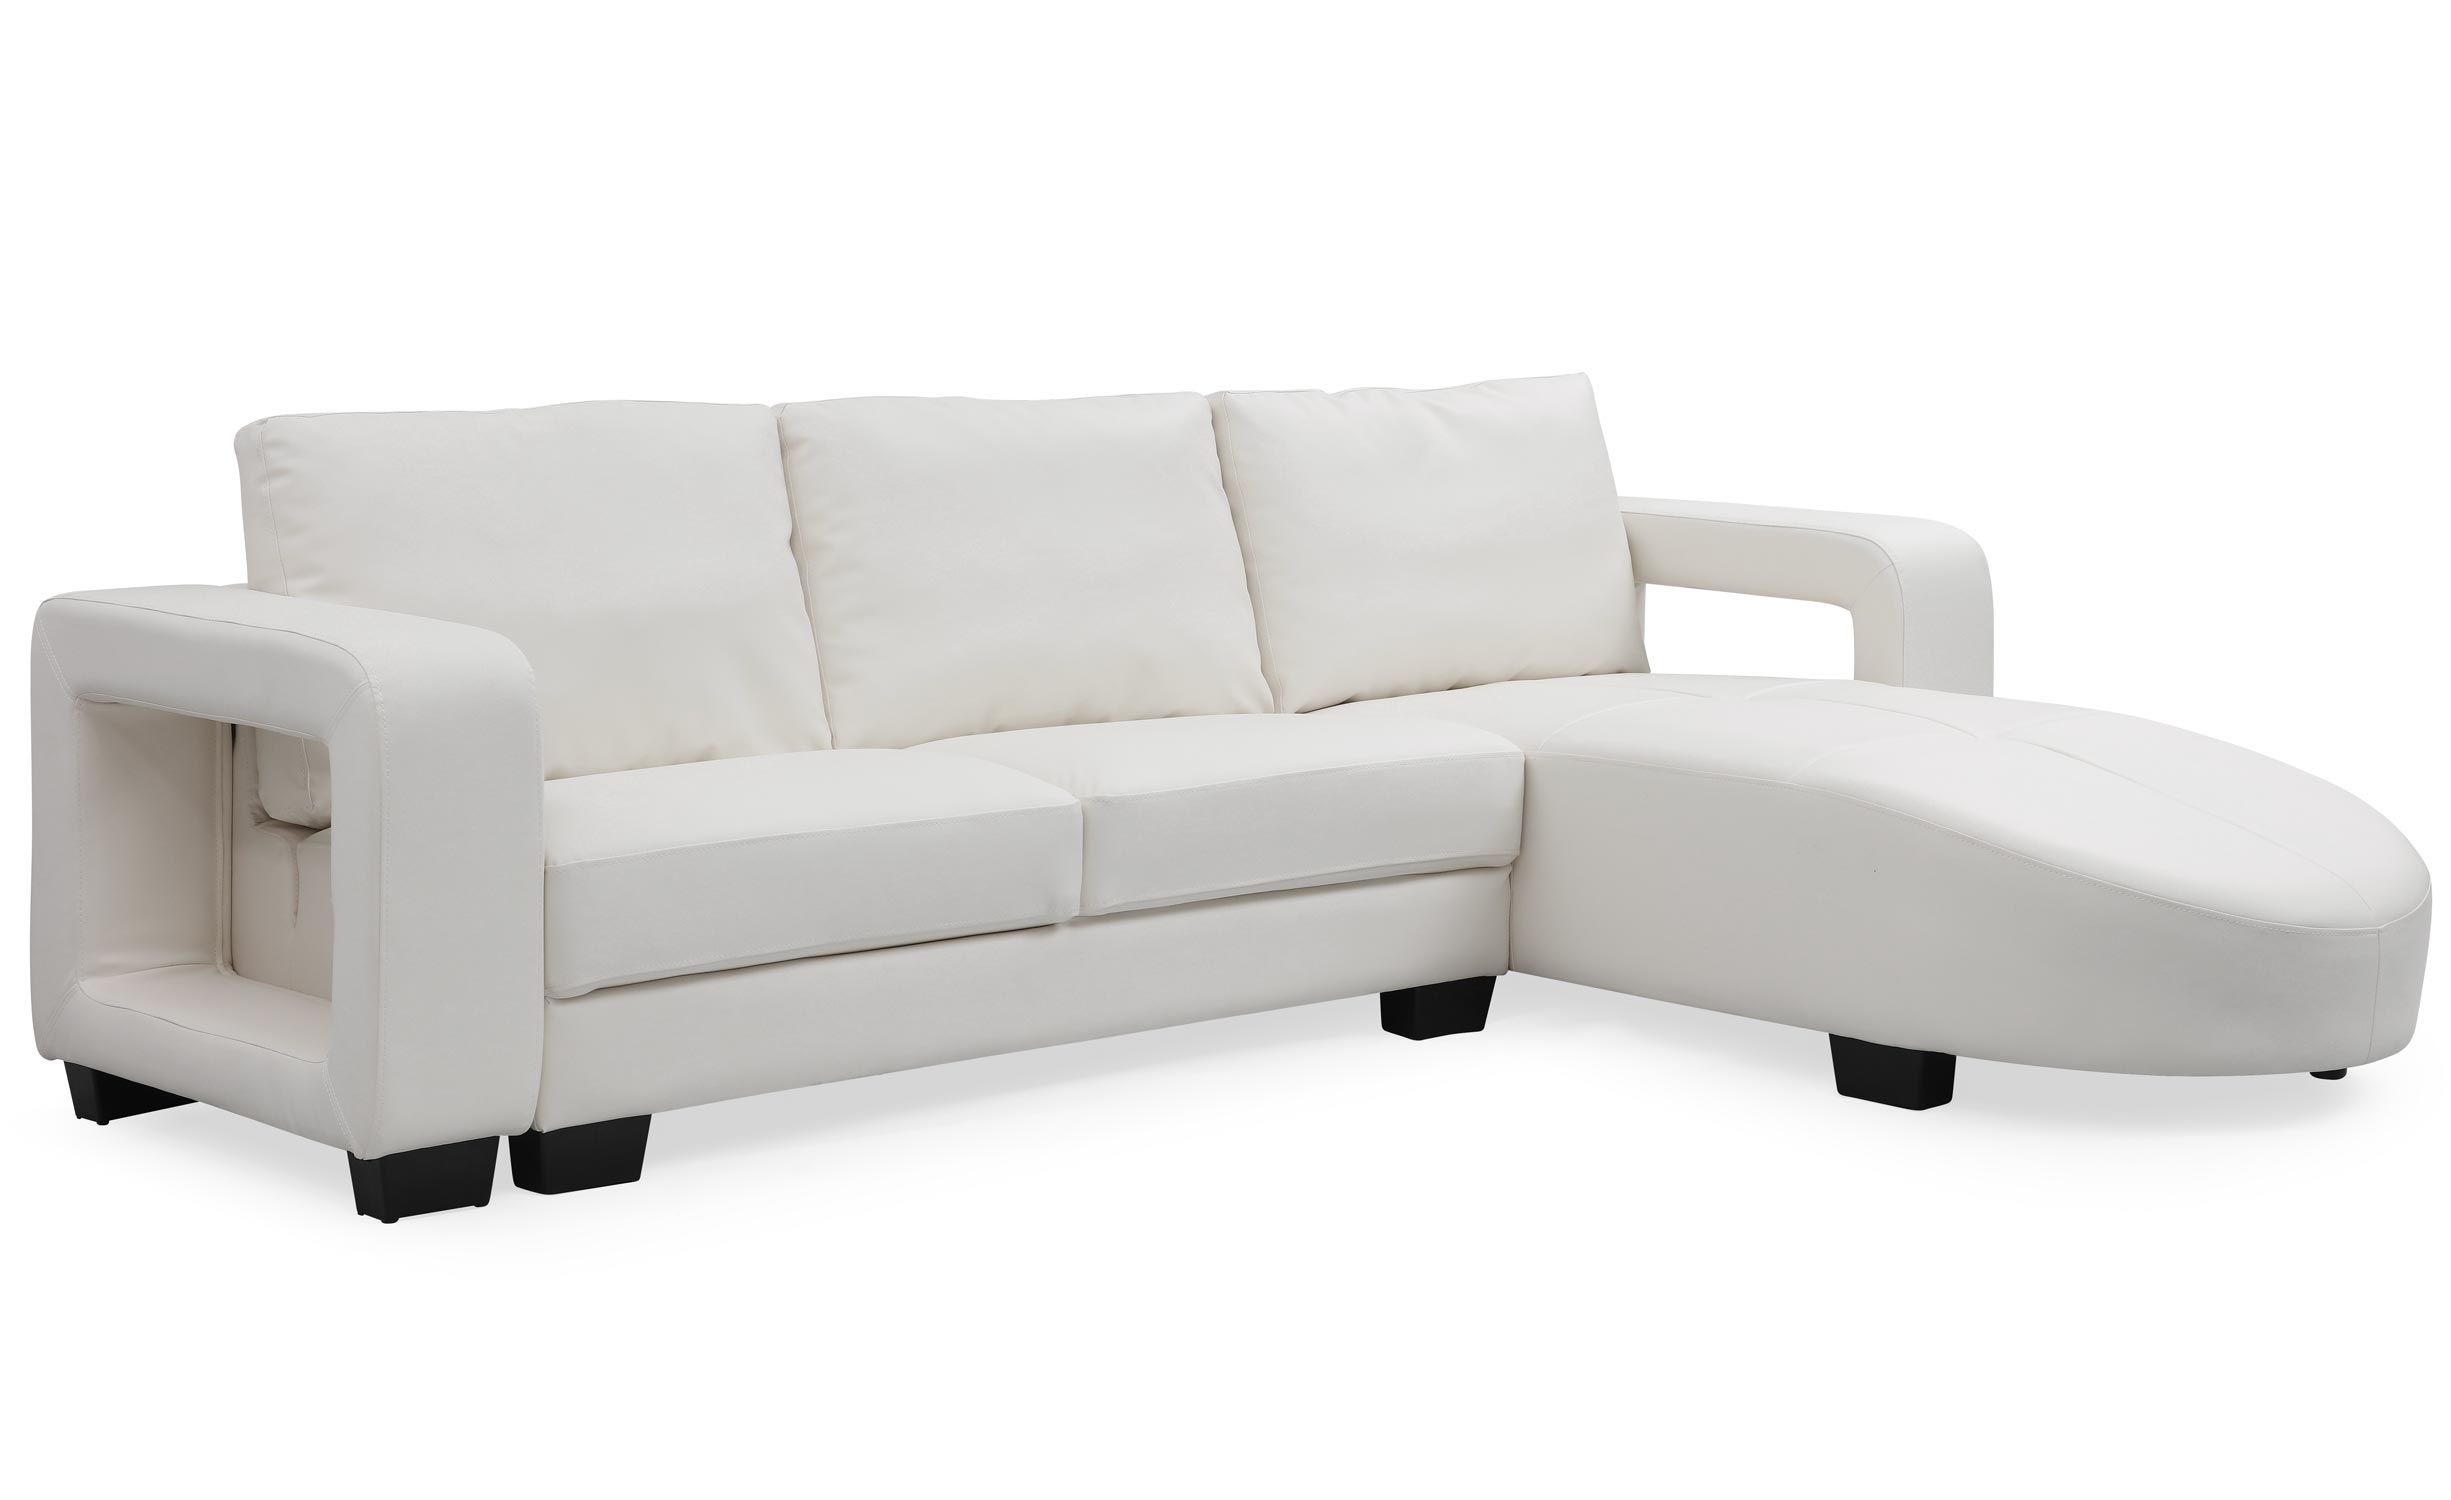 Canapé d'angle en simili cuir Matha Blanc